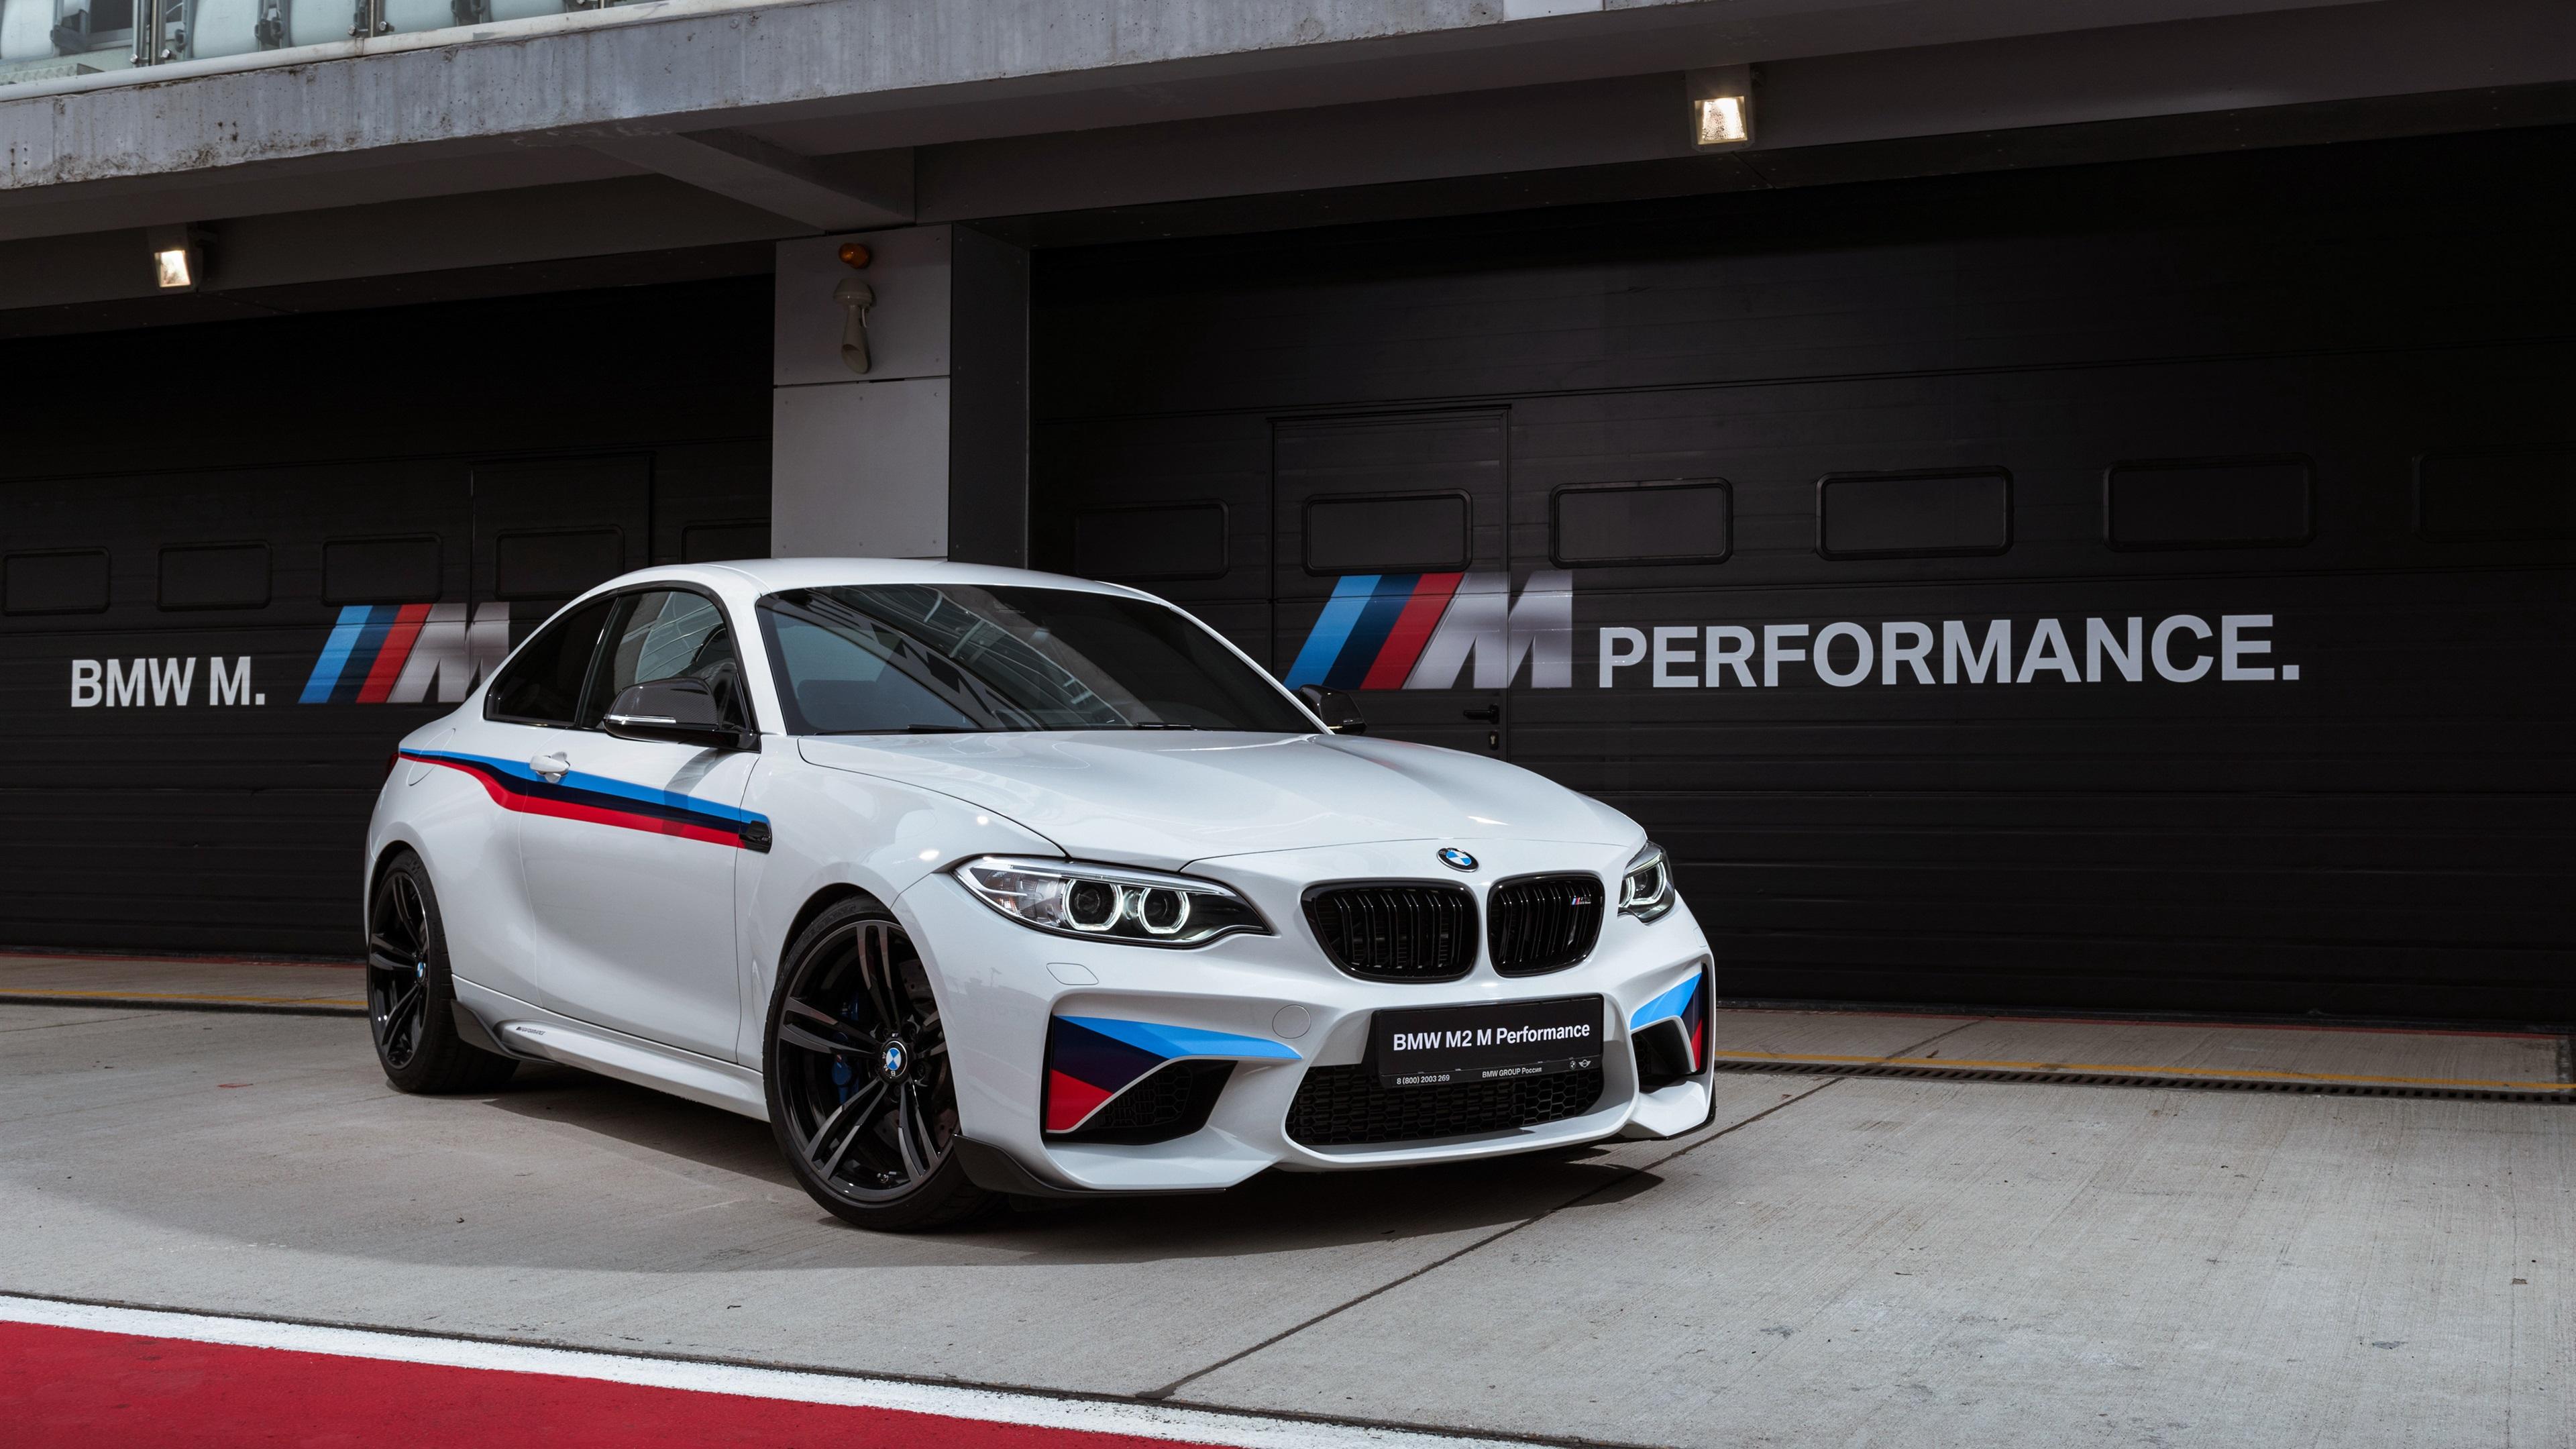 Wallpaper BMW M2 F87 White Coupe 3840x2160 UHD 4K Picture